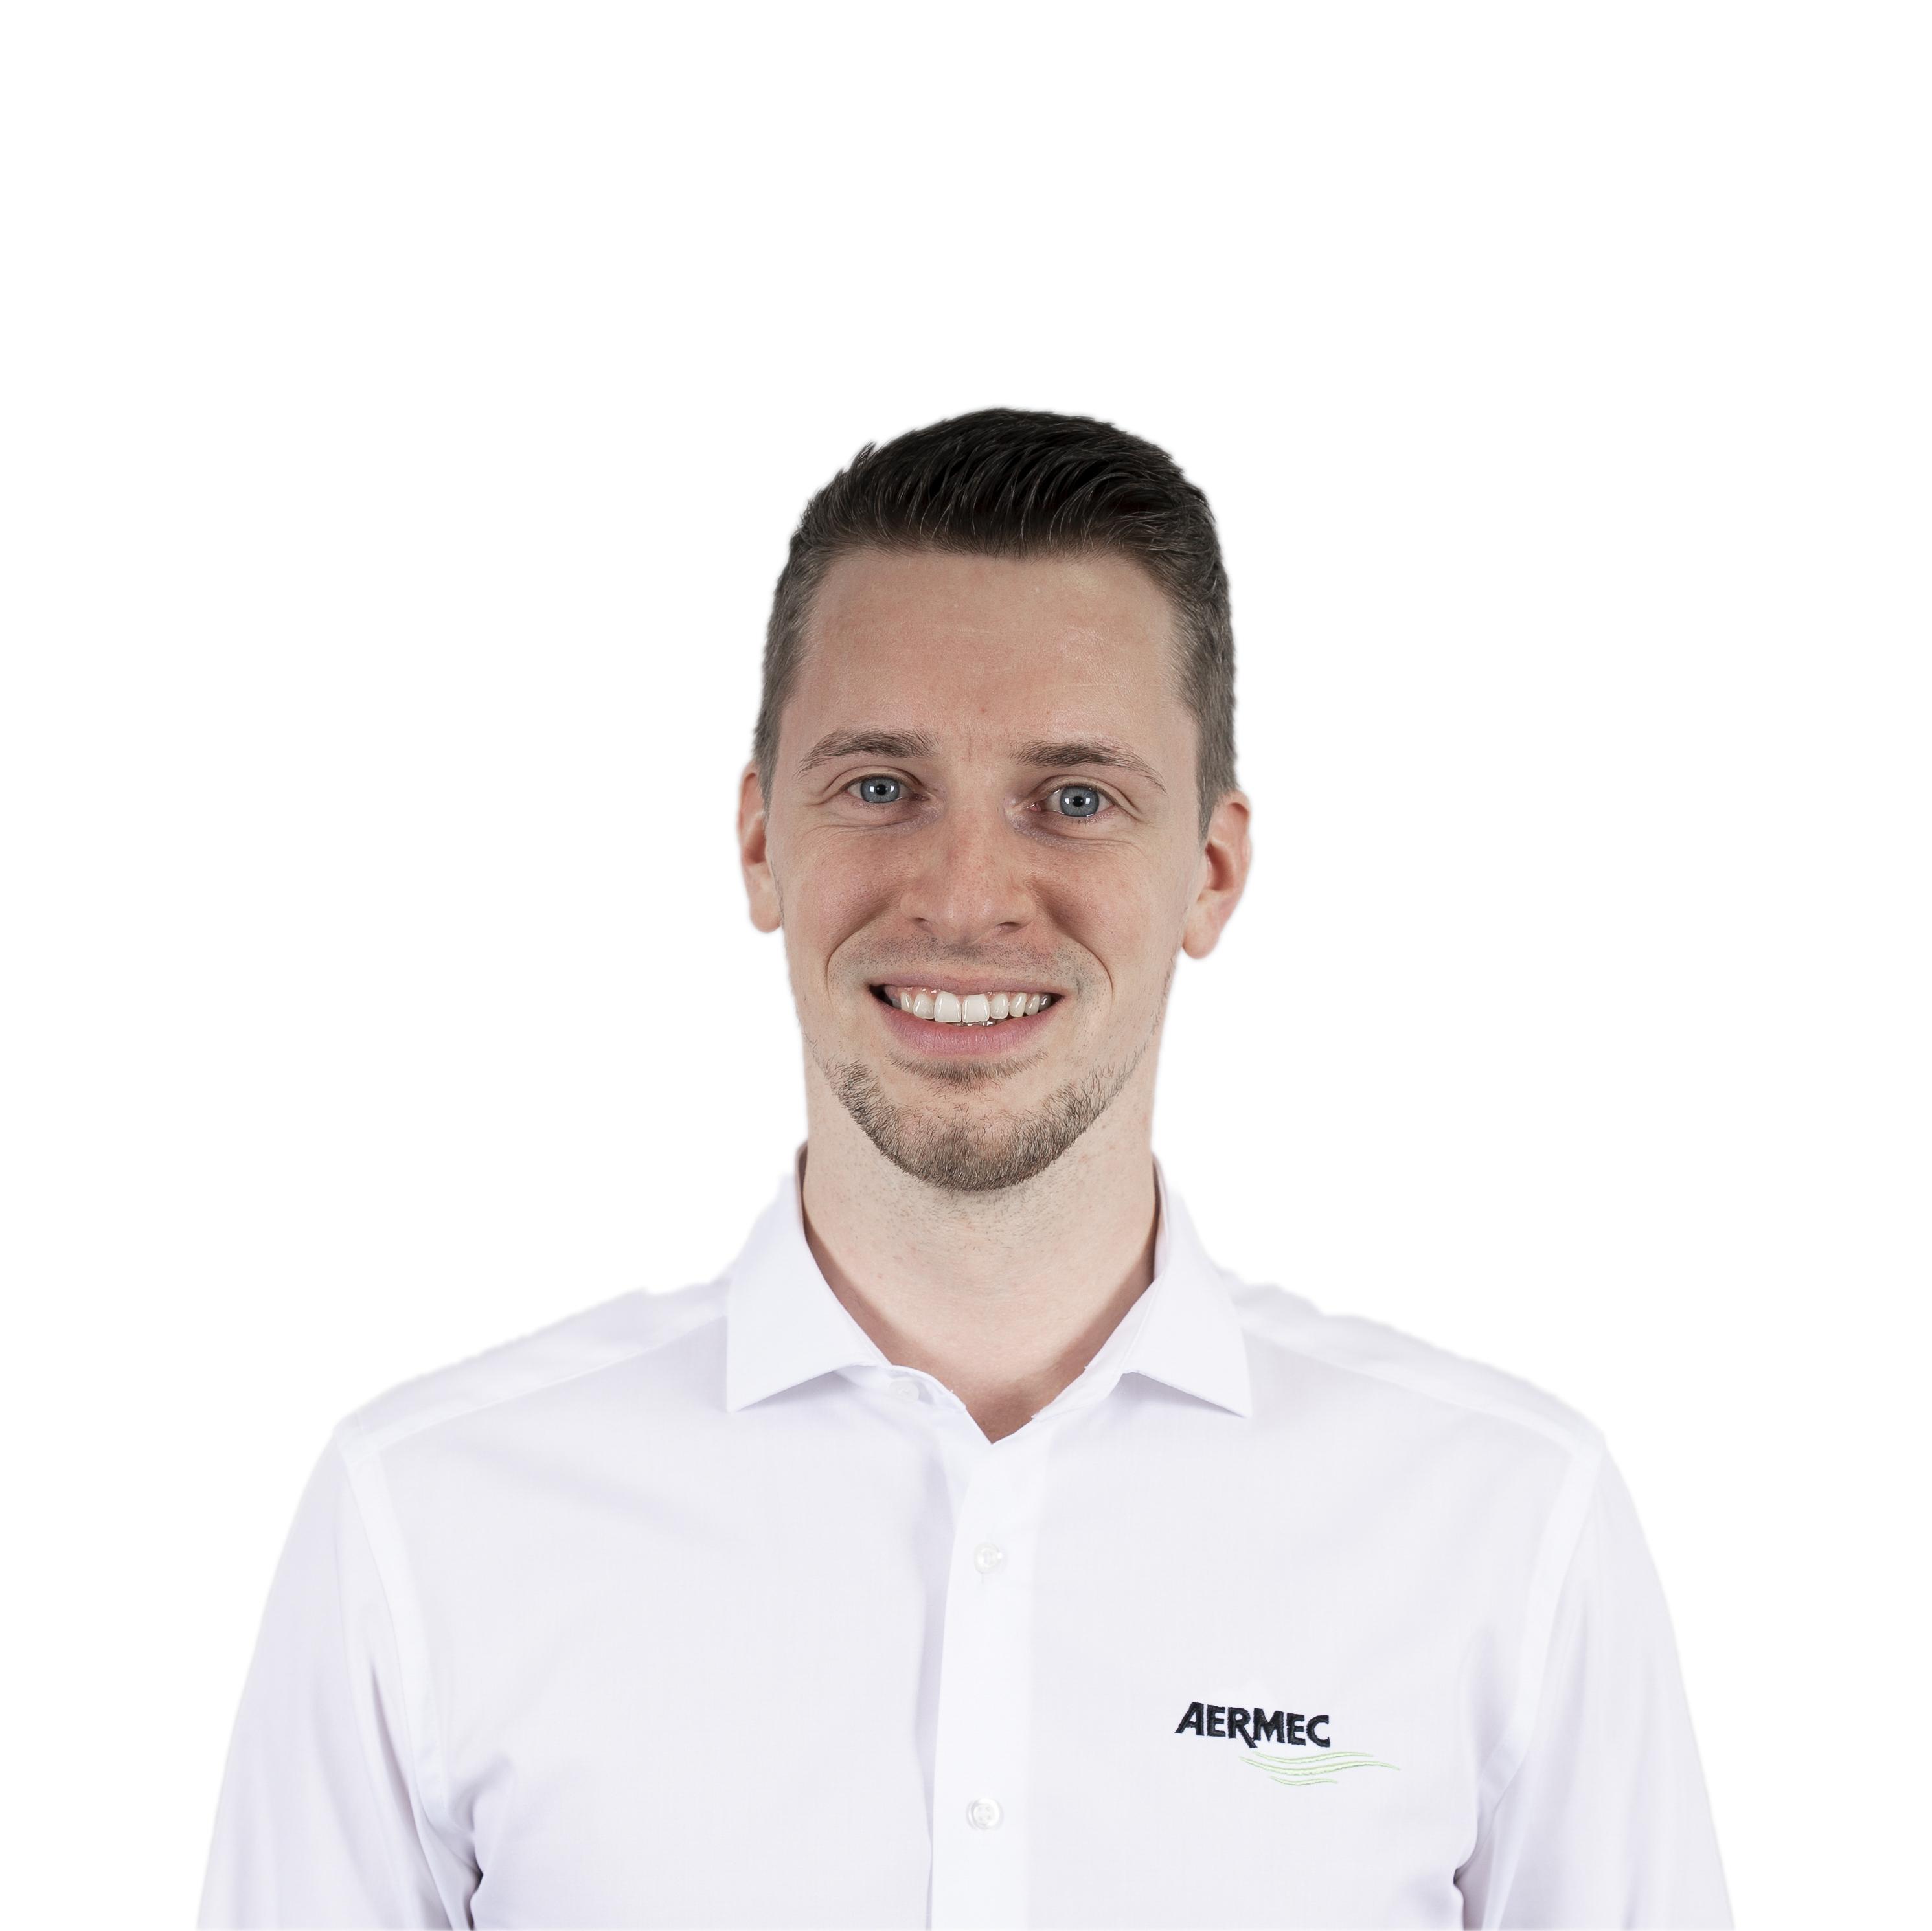 Adrian Lumnitz